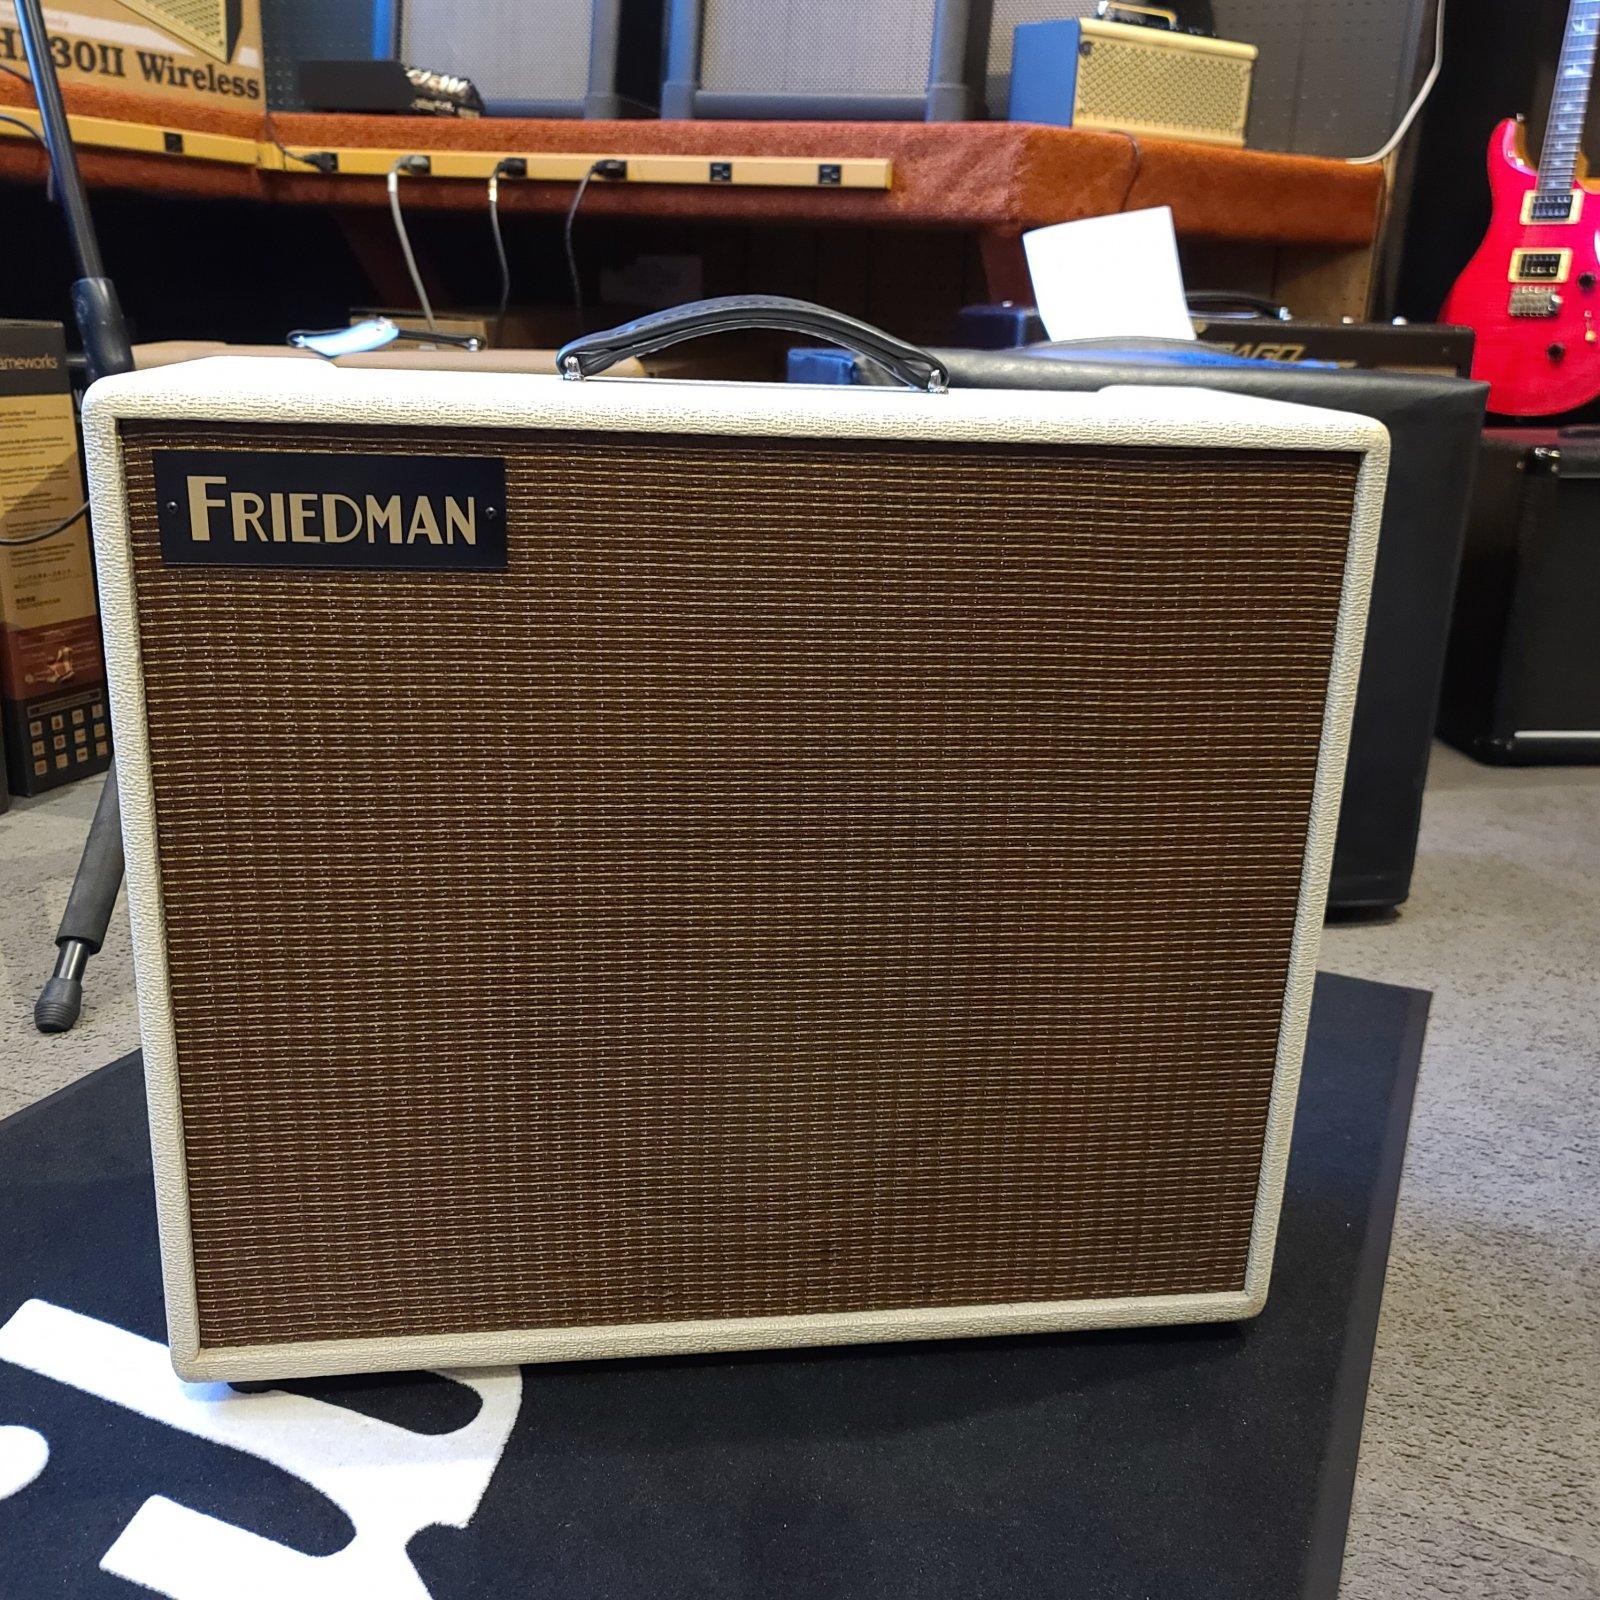 Friedman Buxom Betty Combo Amplifier w/Cover